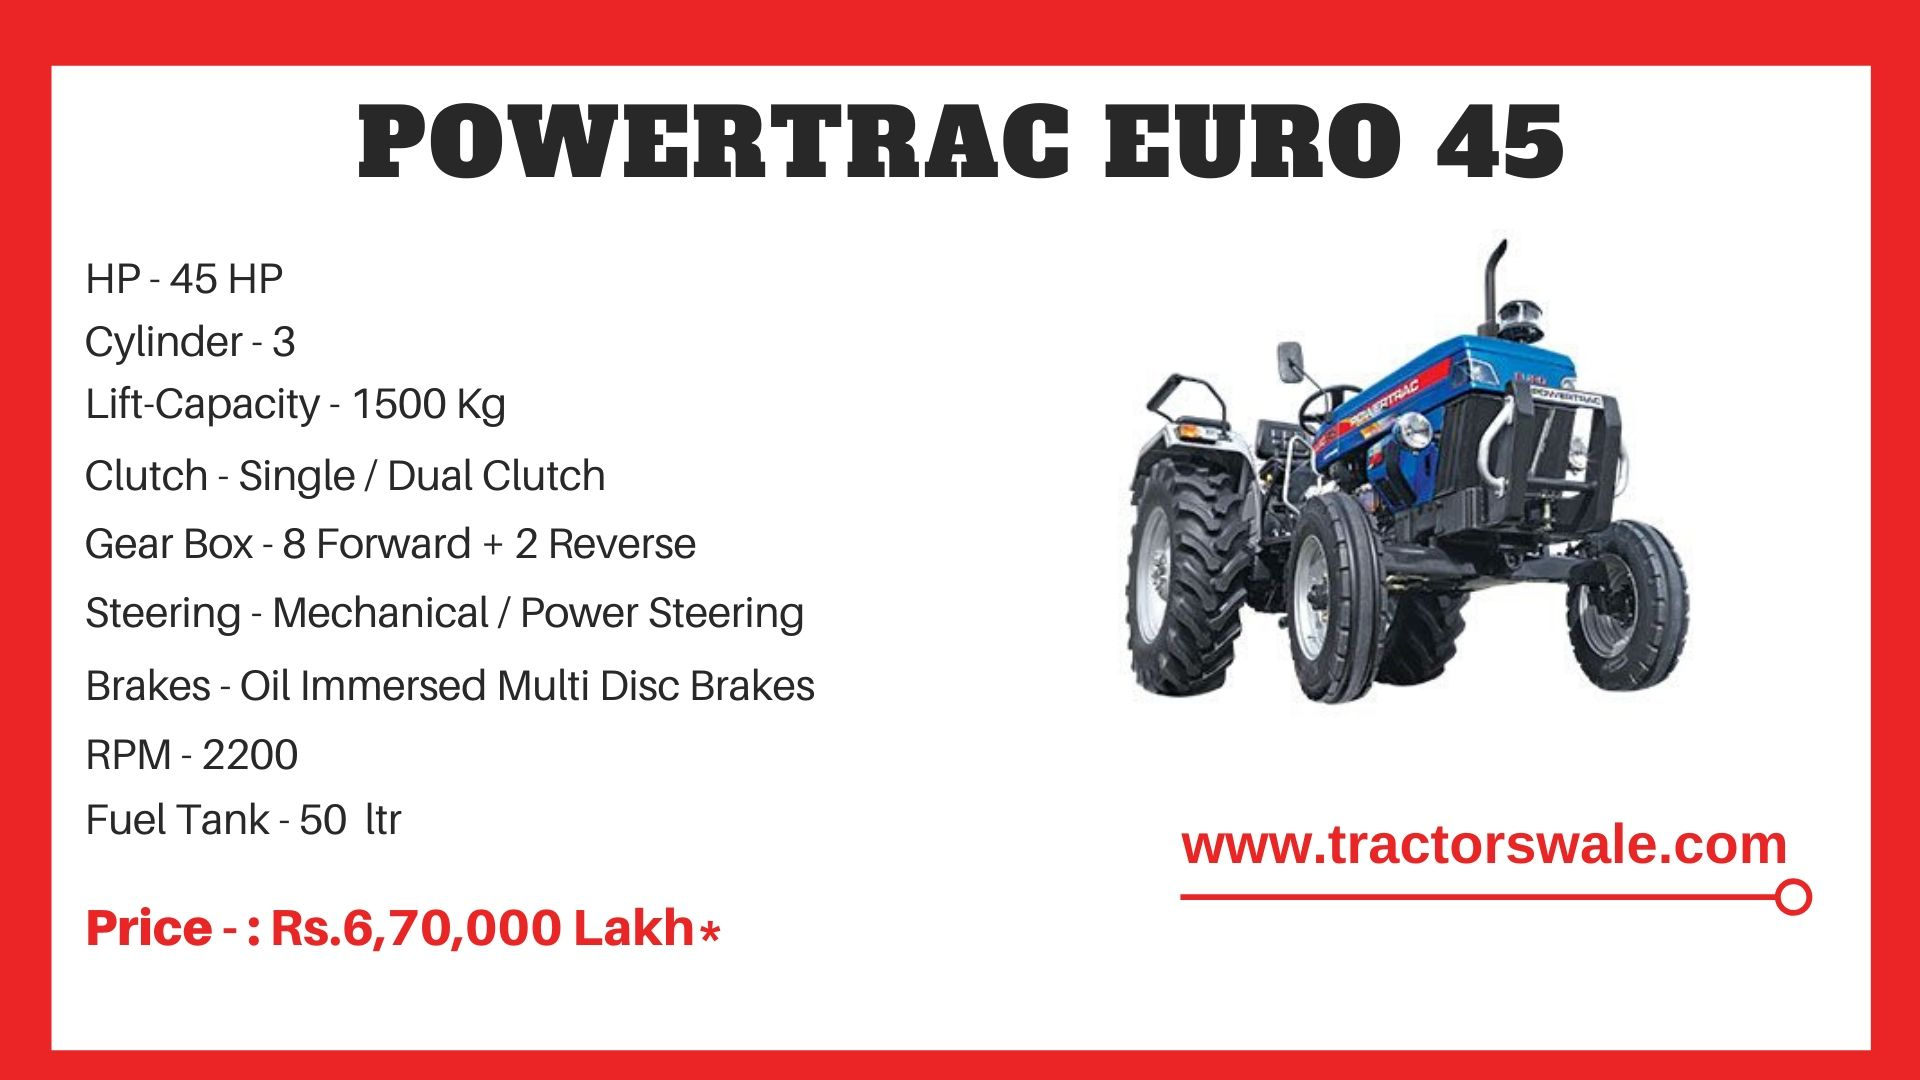 PowerTrac Euro 45 tractor price